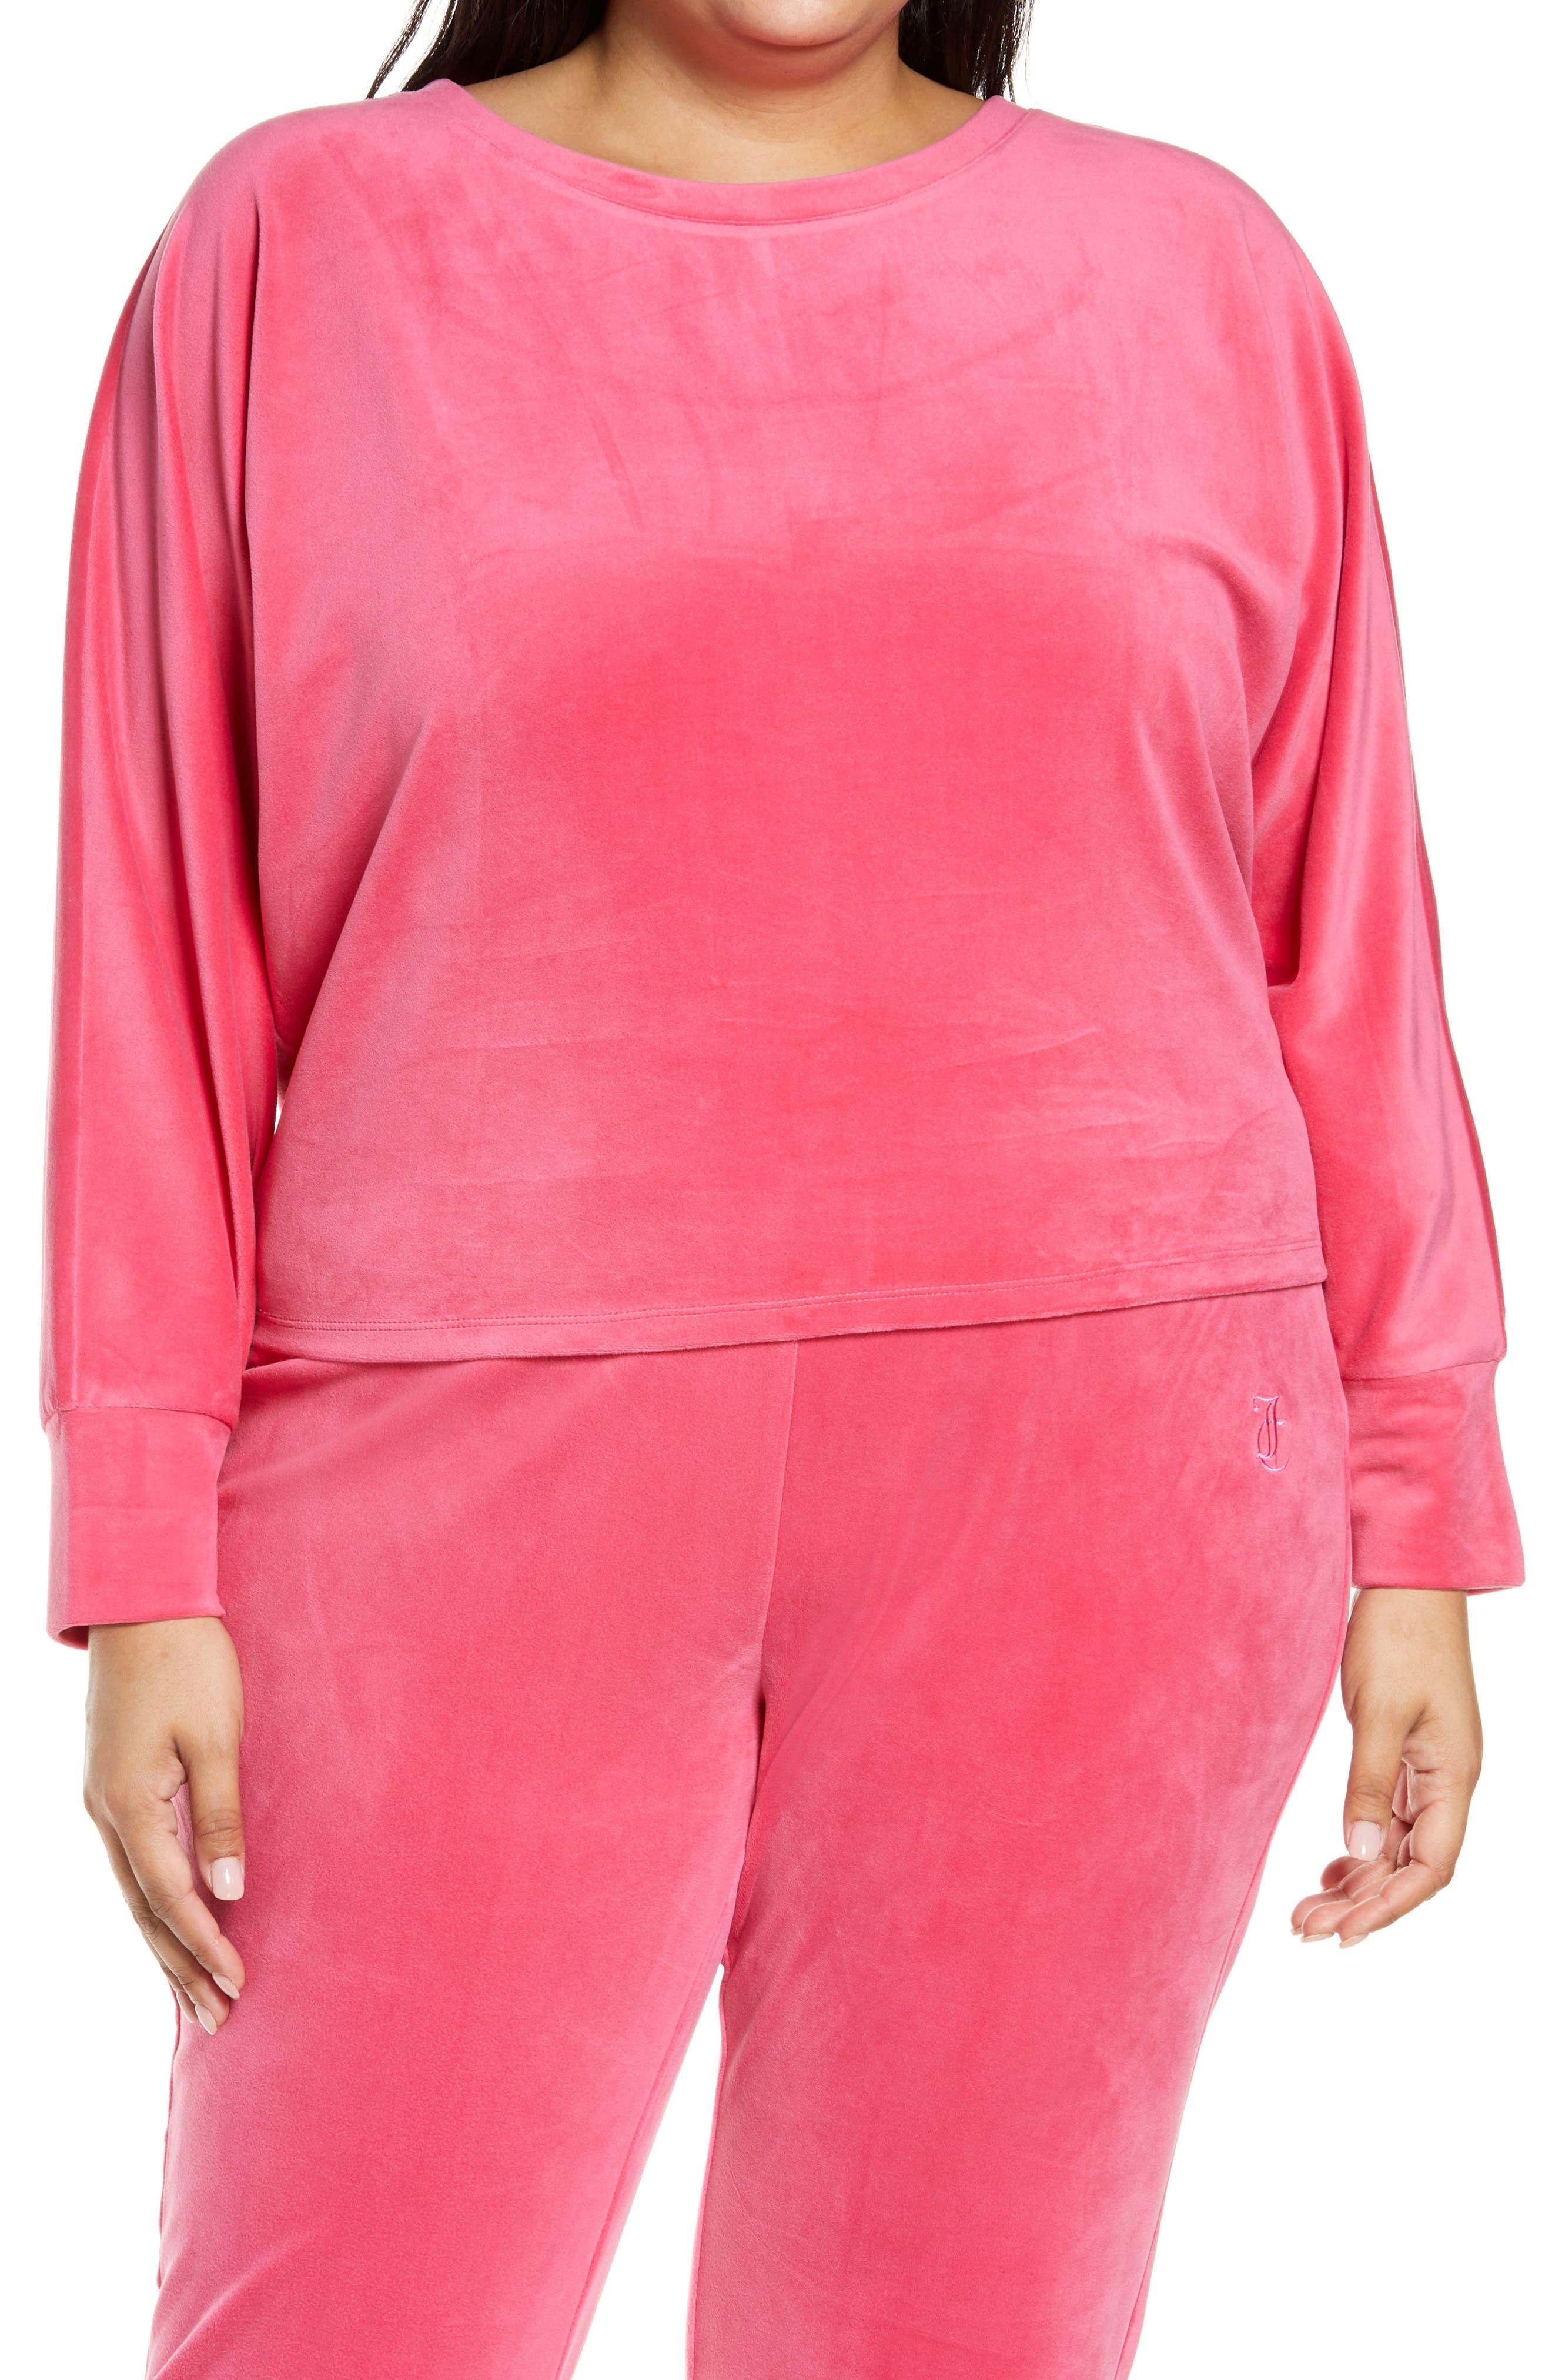 Women's Dolman Sleeve Velour Sweatshirt